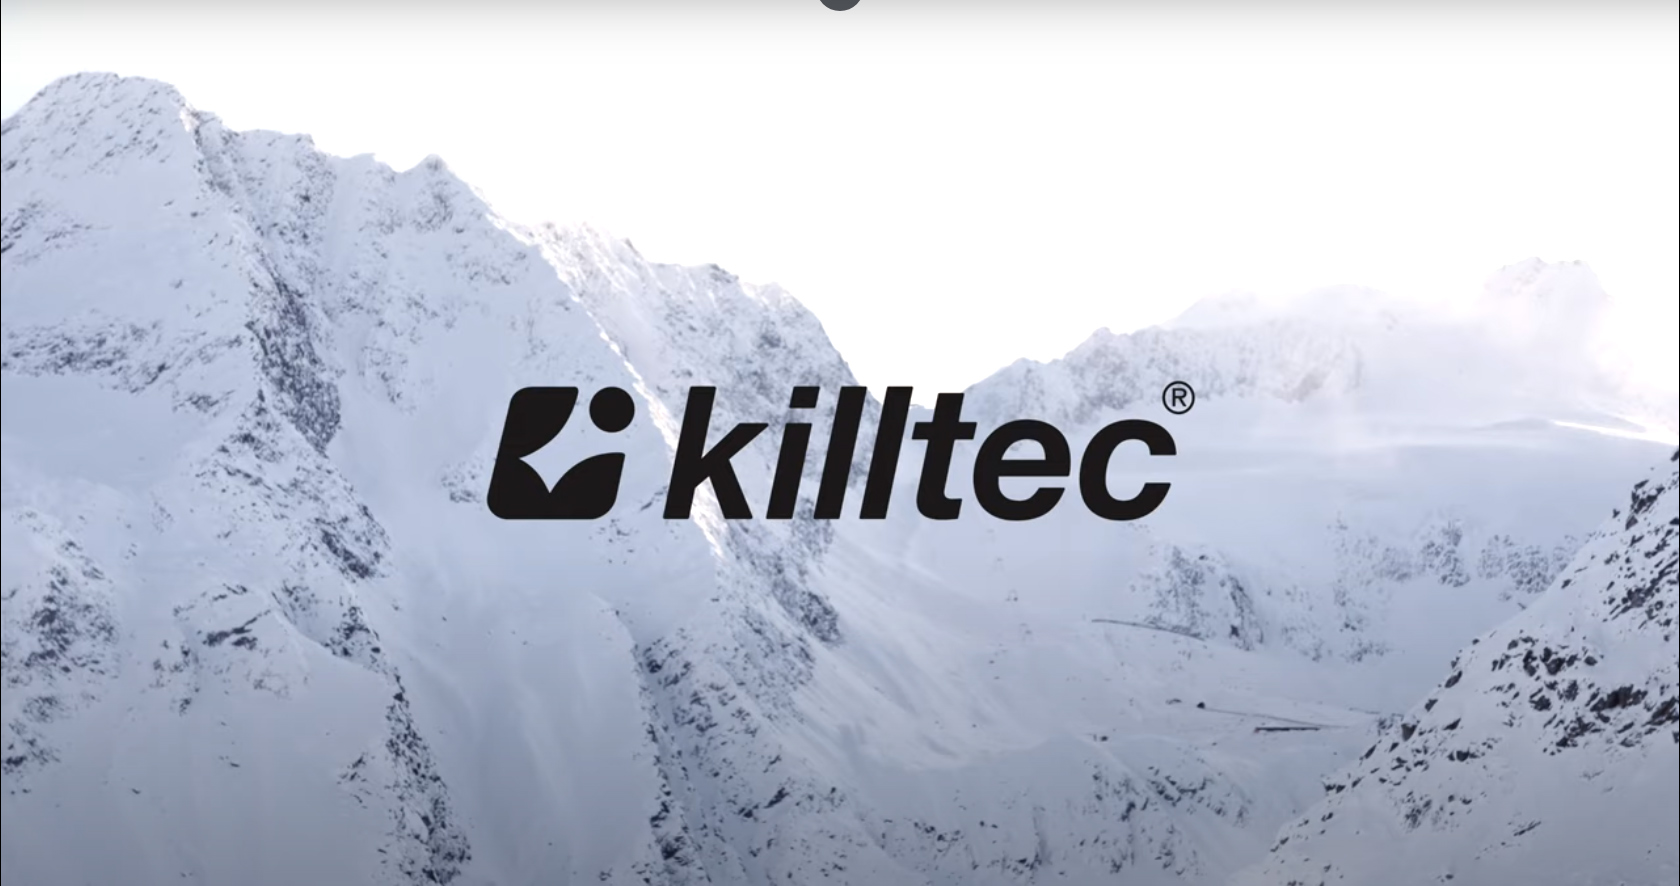 https://killtec.pl/sites/default/files/revslider/image/cover.jpg